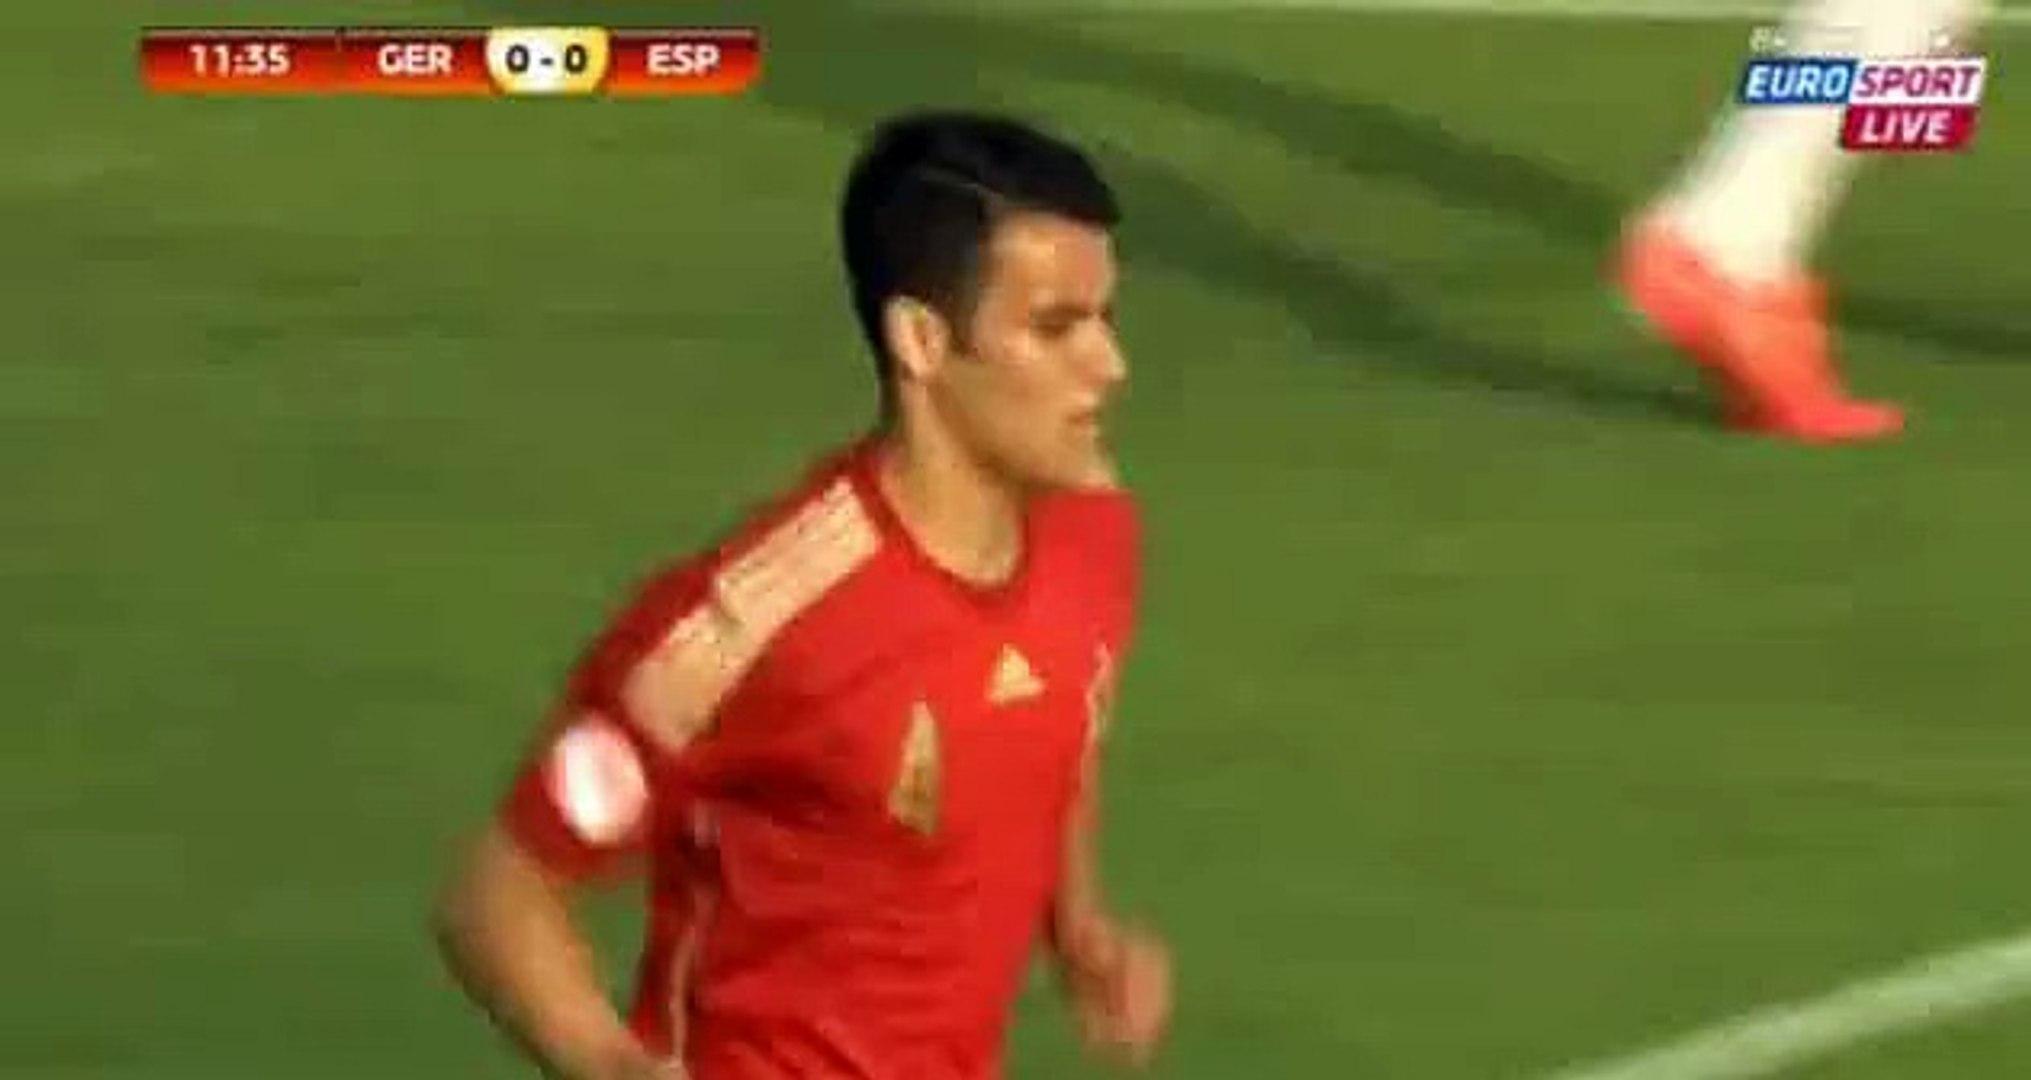 Alex Martin chance - Germany vs Spain Under U17 Euro 15.05.2015